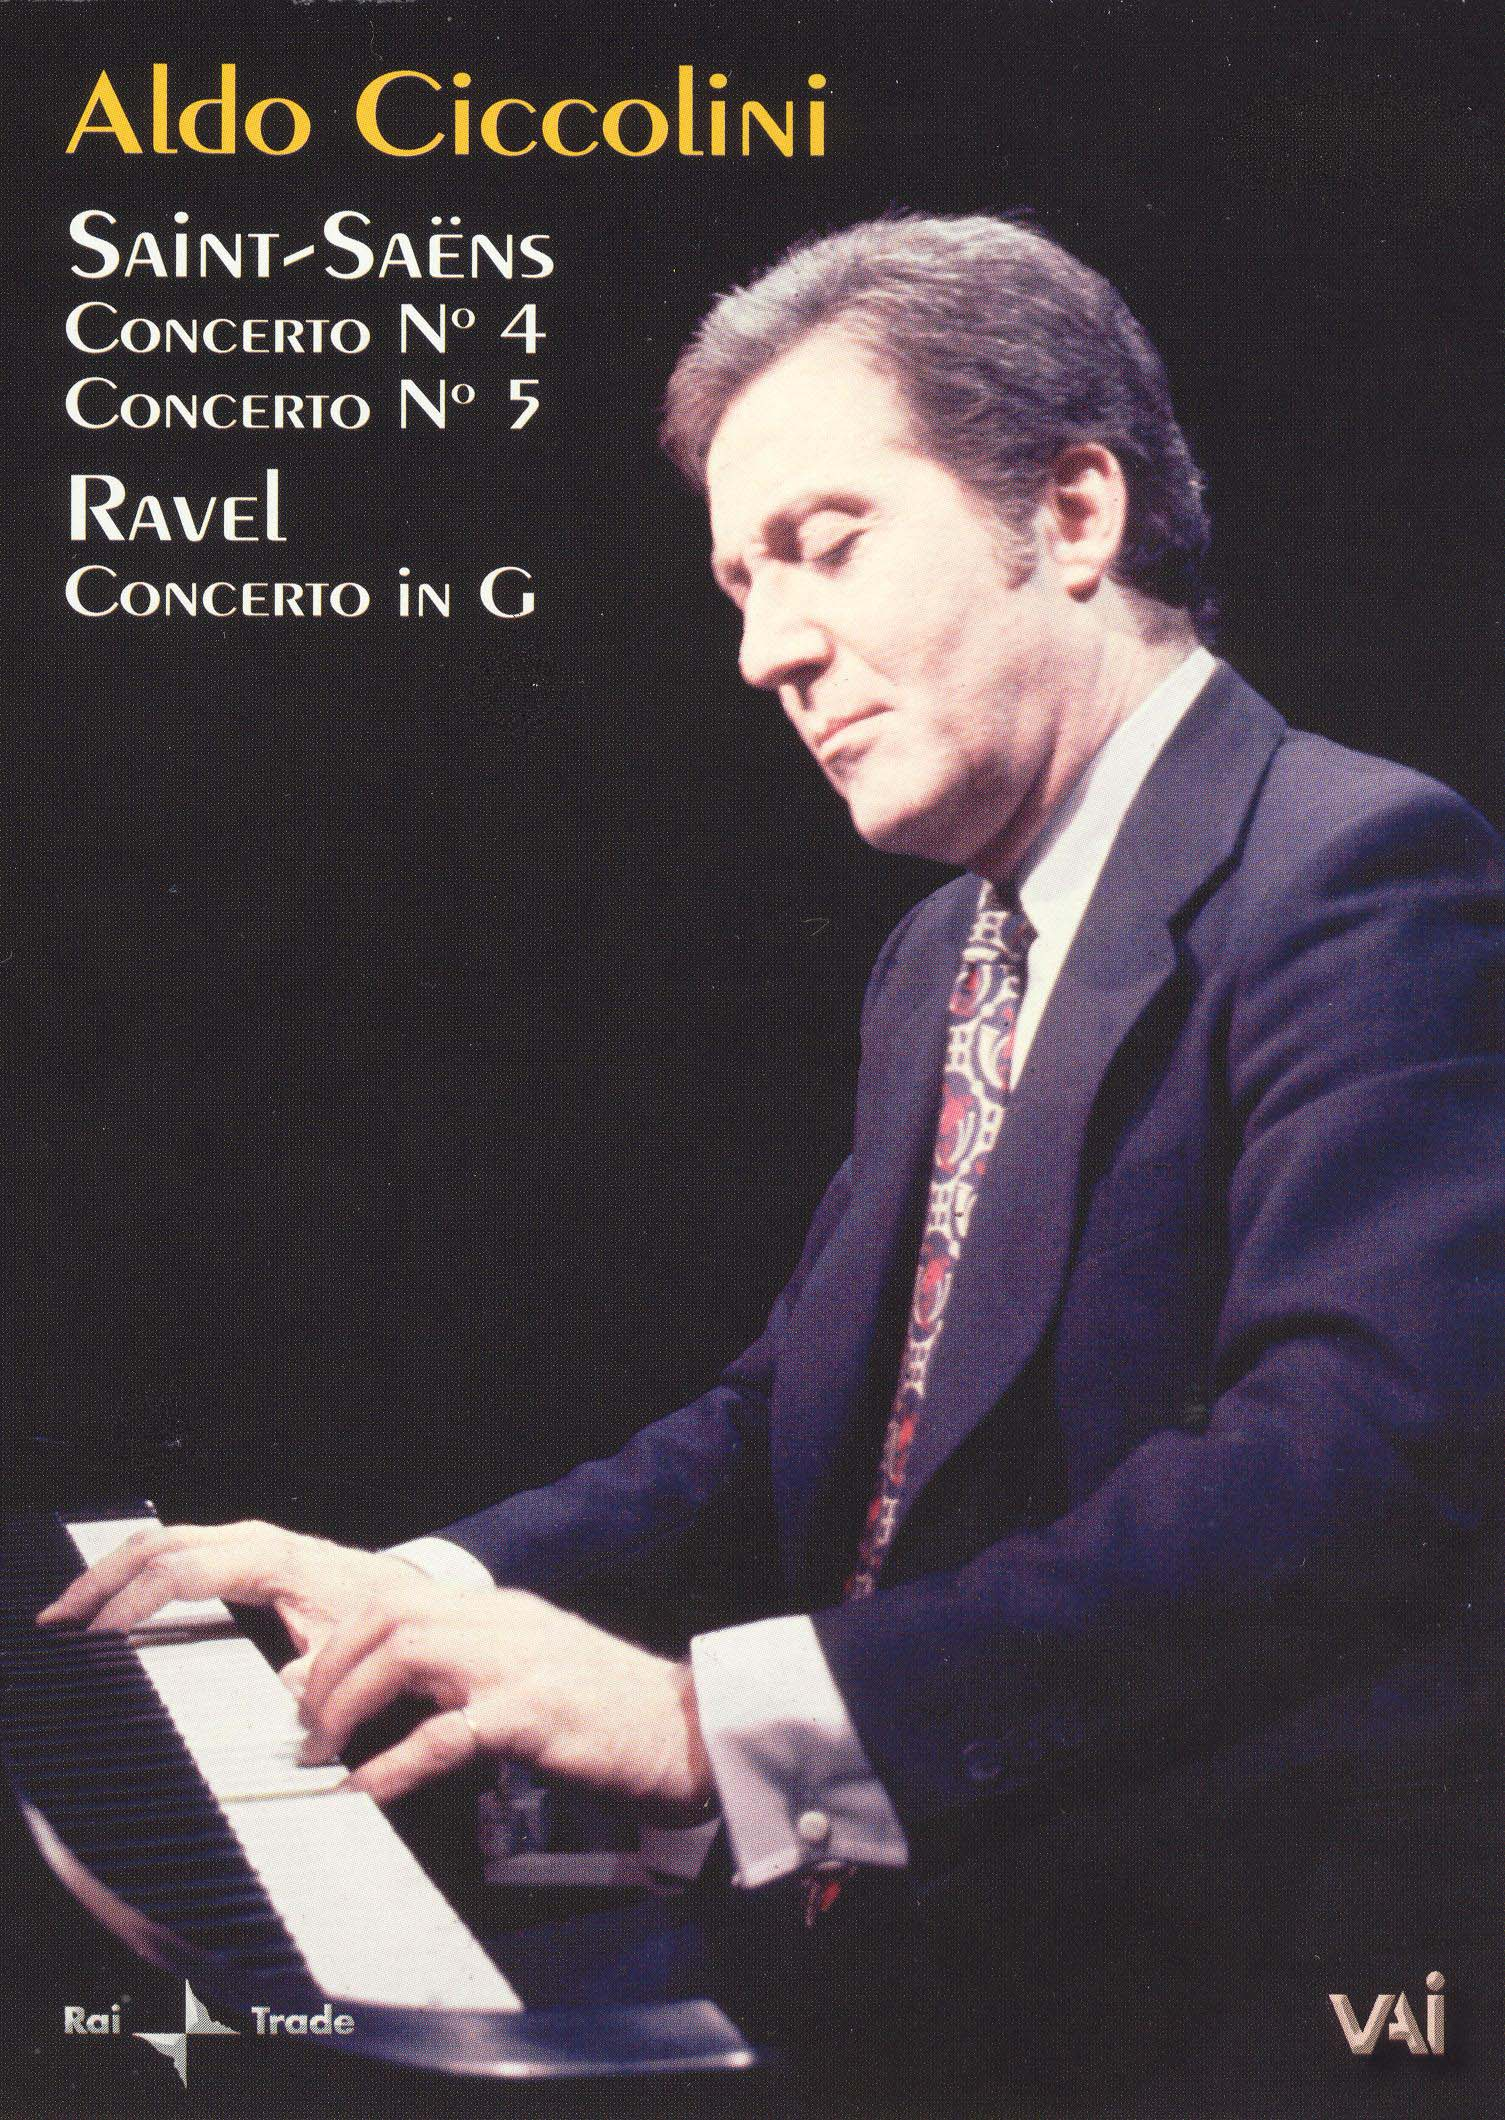 Aldo Ciccolini: Saint-Saëns / Ravel